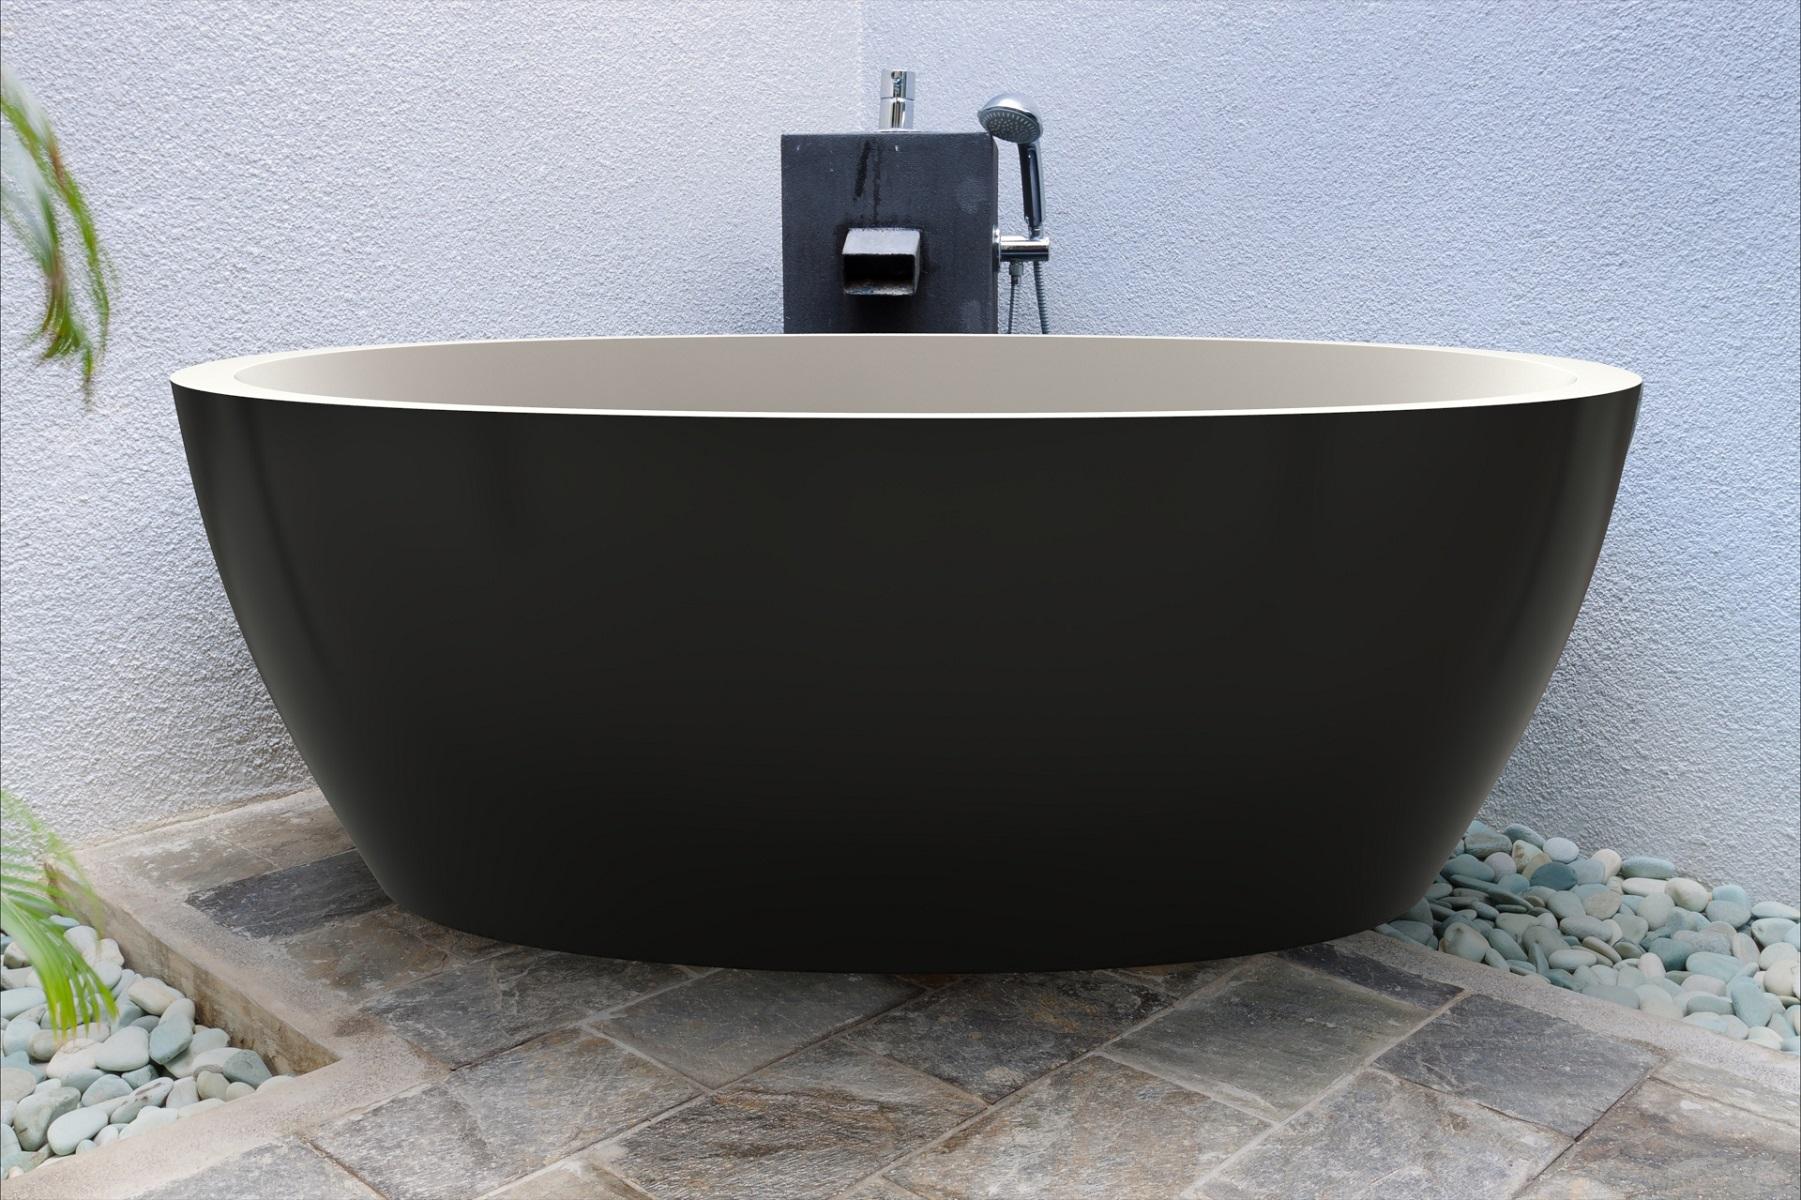 Aquatica Sensuality Black Wht Freestanding Solid Surface Bathtub